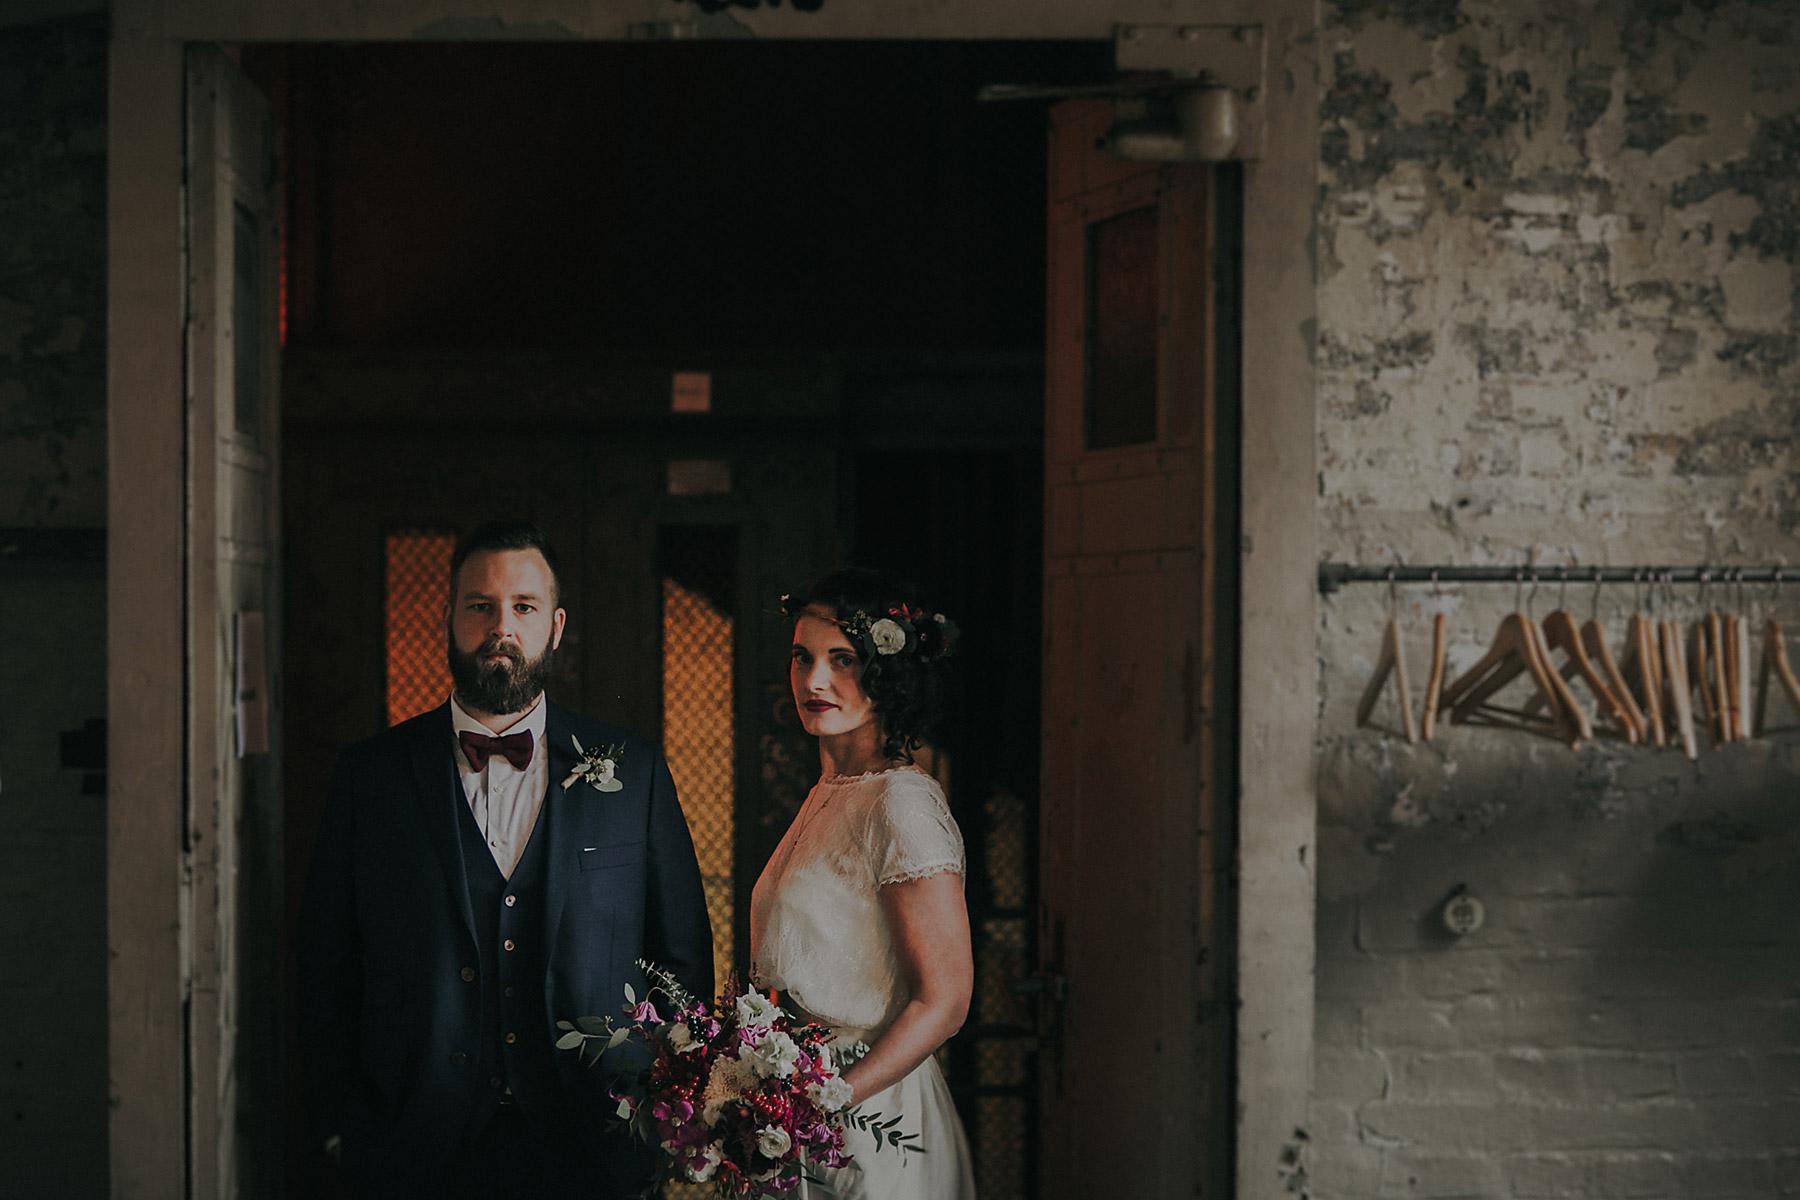 Hochzeitsfotograf_Berlin_WeddingPhotographer_080c